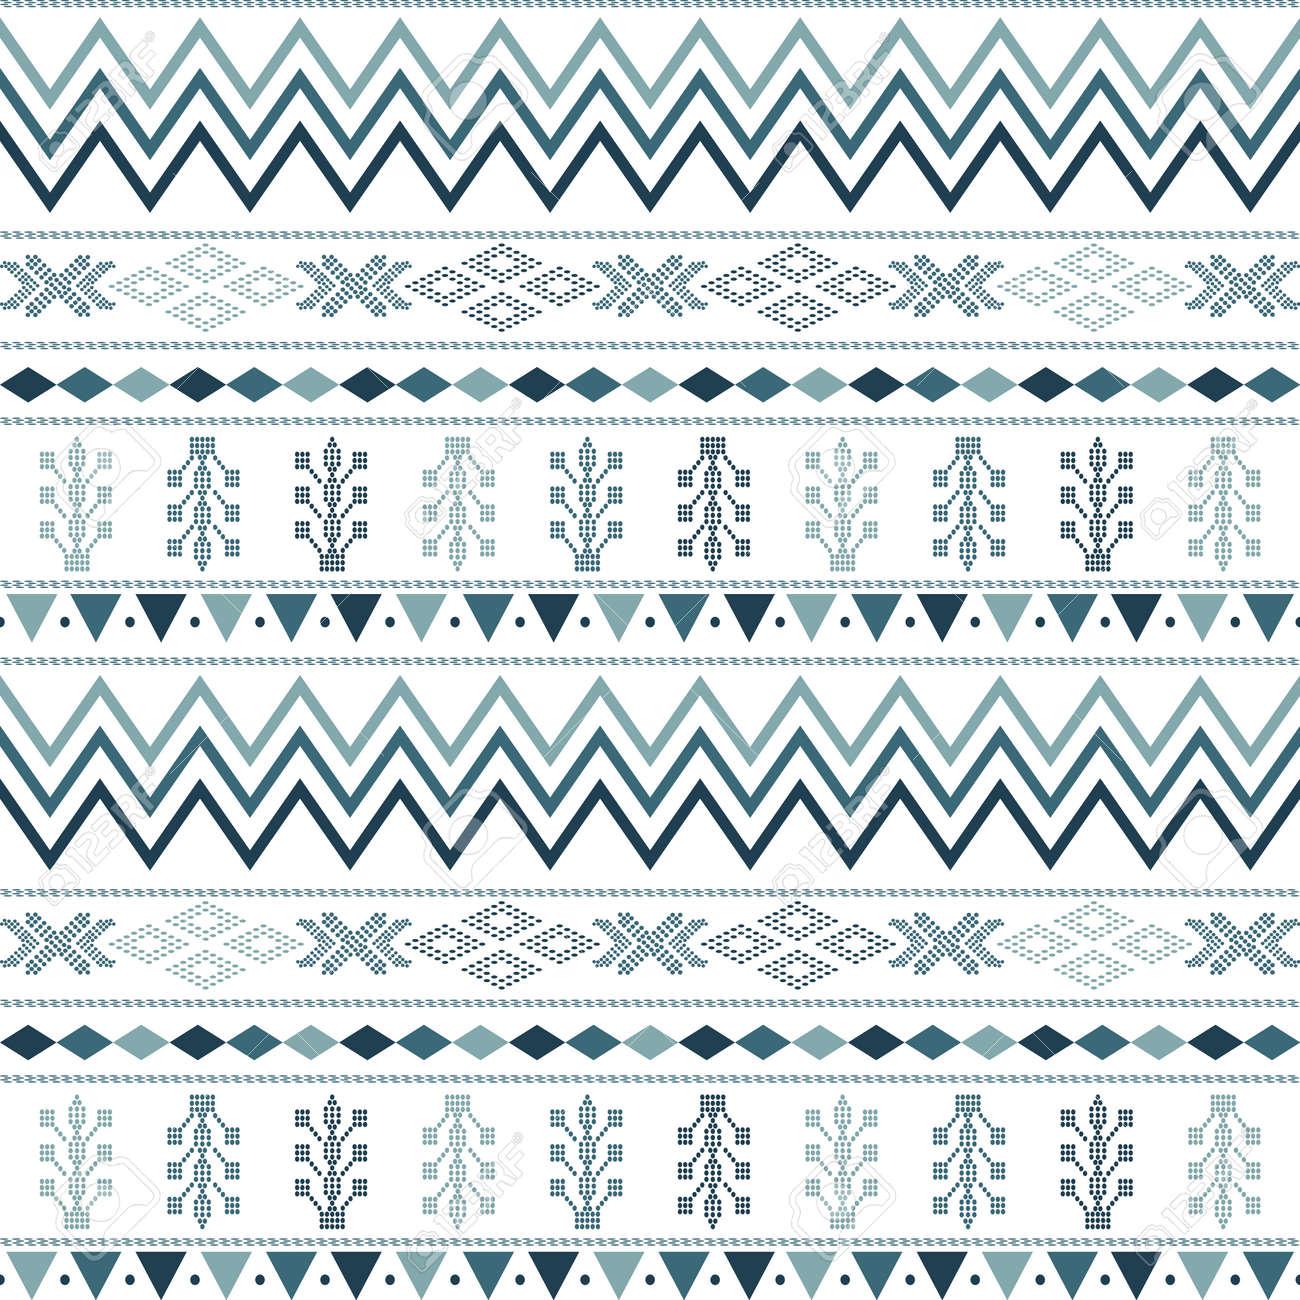 seamless pattern with motif Aztec tribal geometric shapes. seamless traditional textile bandhani sari border. creative seamless indiant bandhani textures border - 159756371